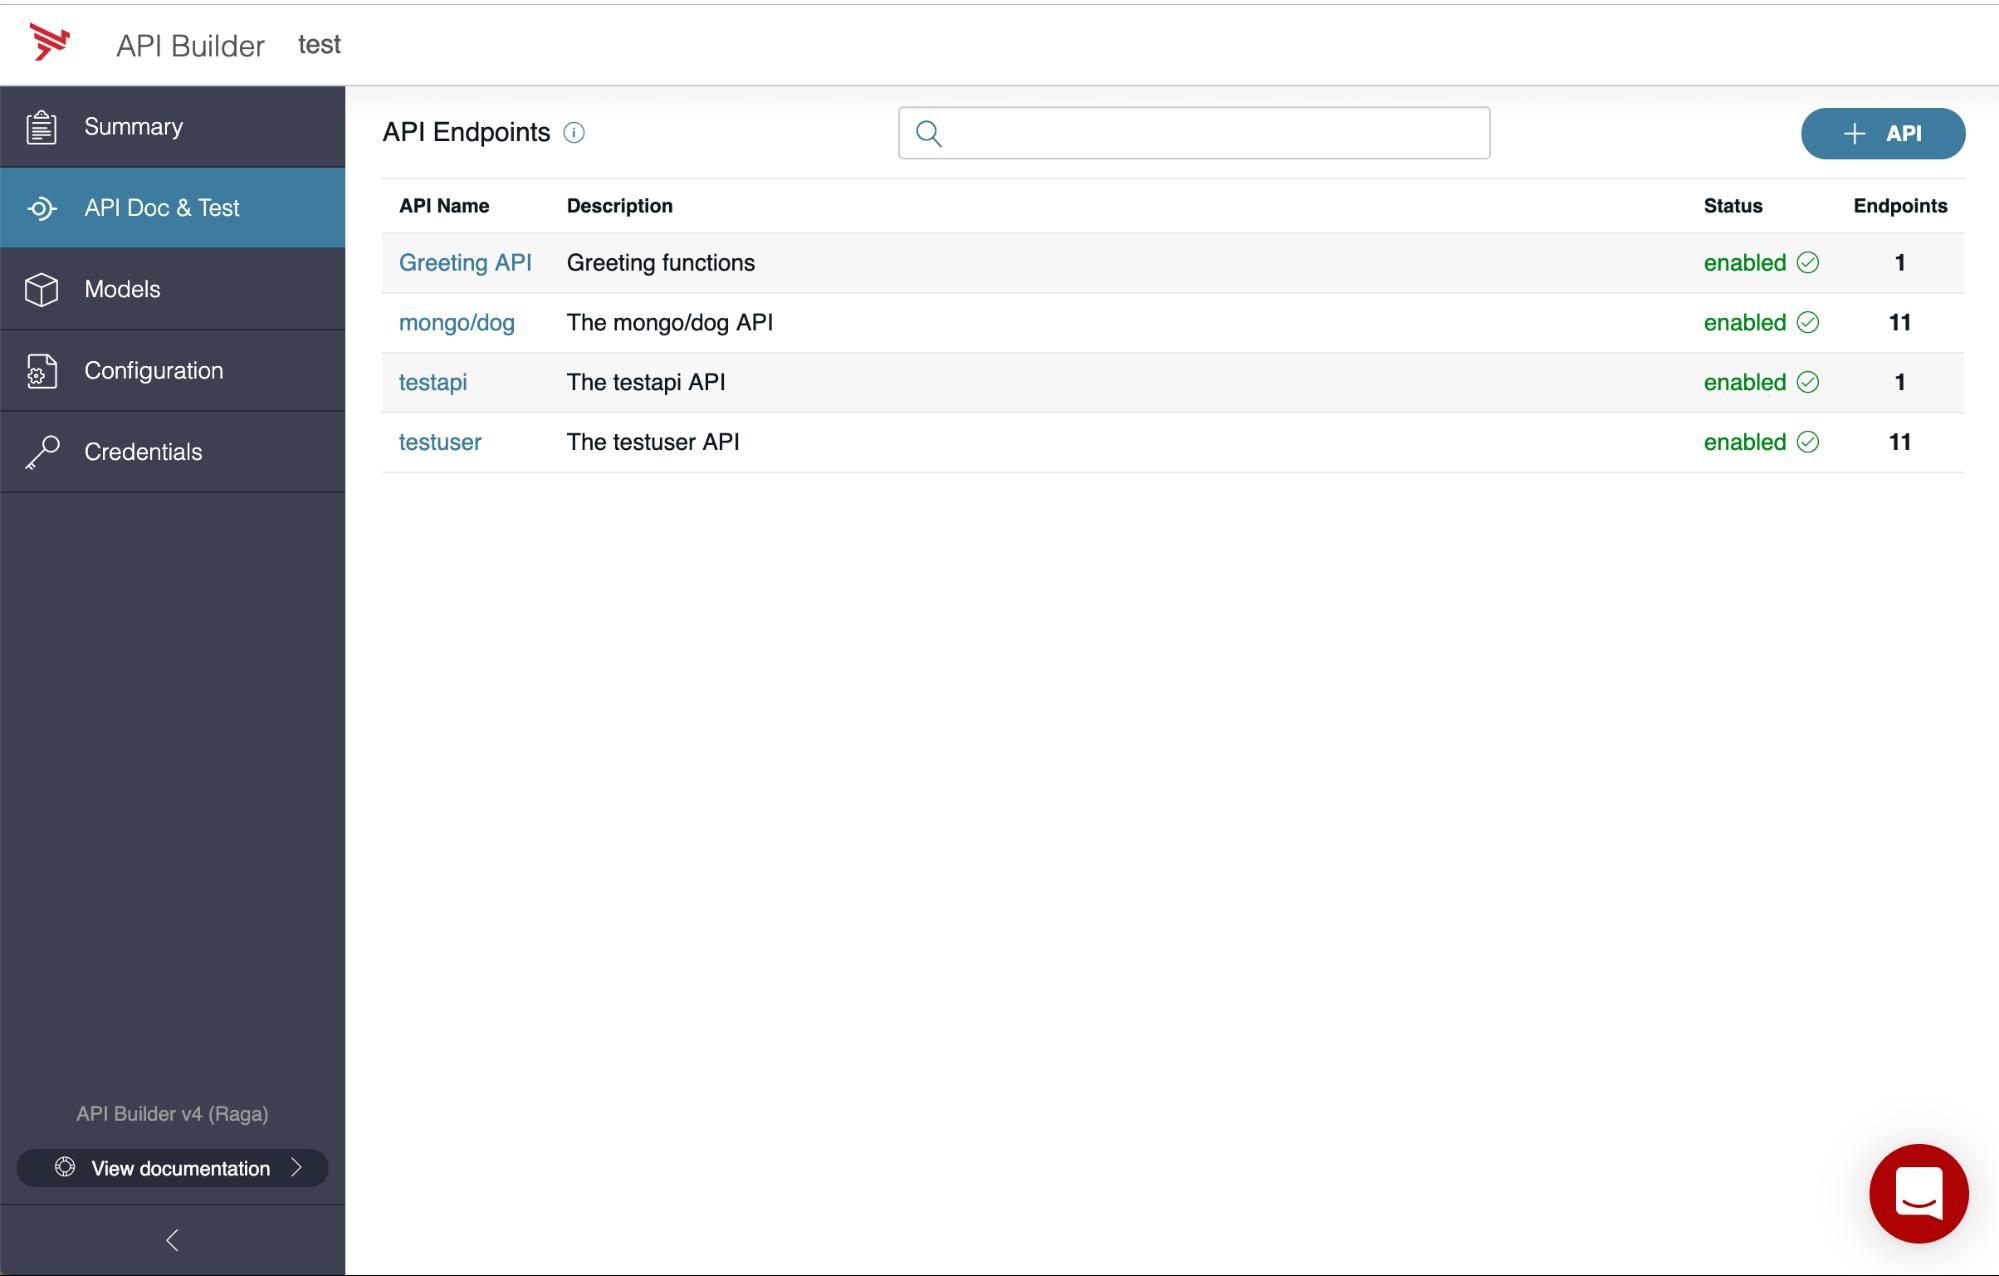 API Builder - API Doc & Test tab